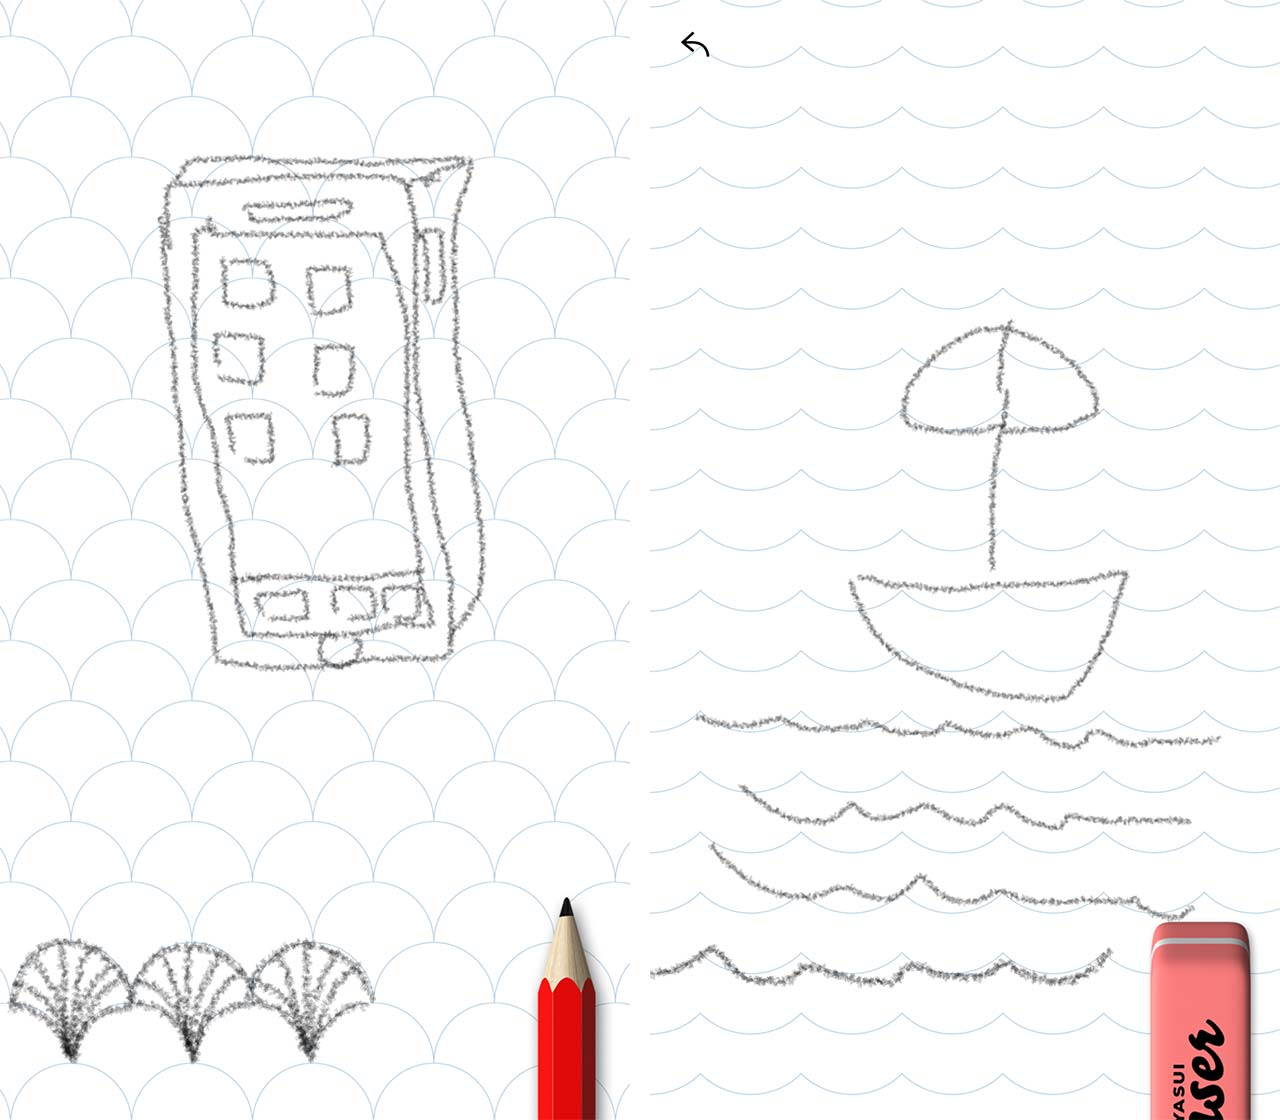 Doodle Book drawings